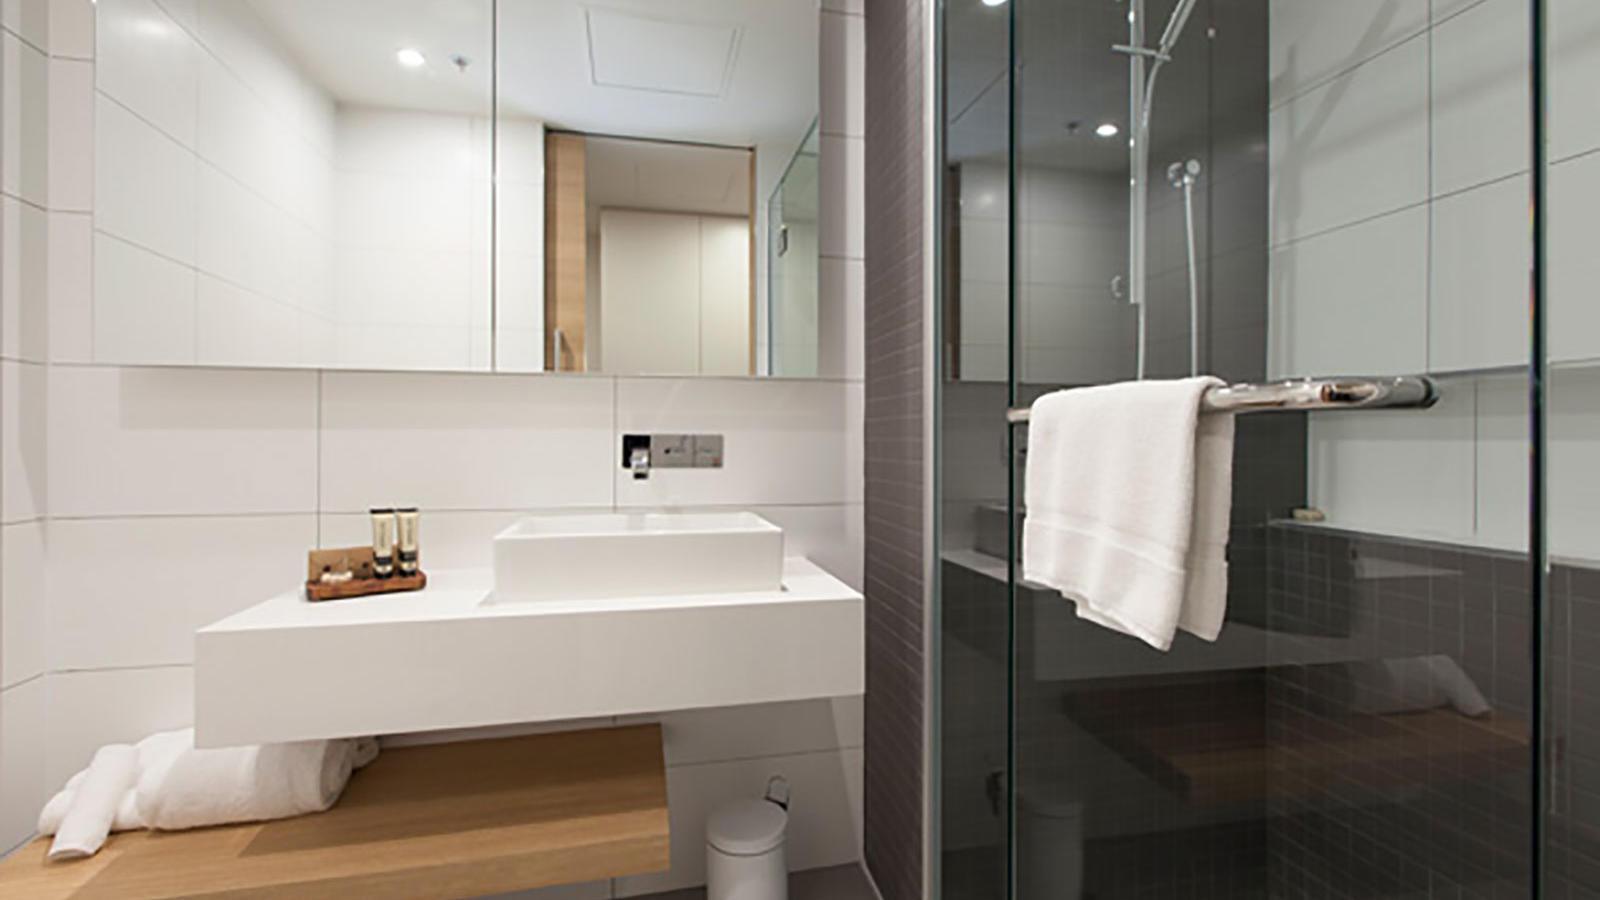 Bathroom of Jasper Suite at Jasper Hotel Melbourne